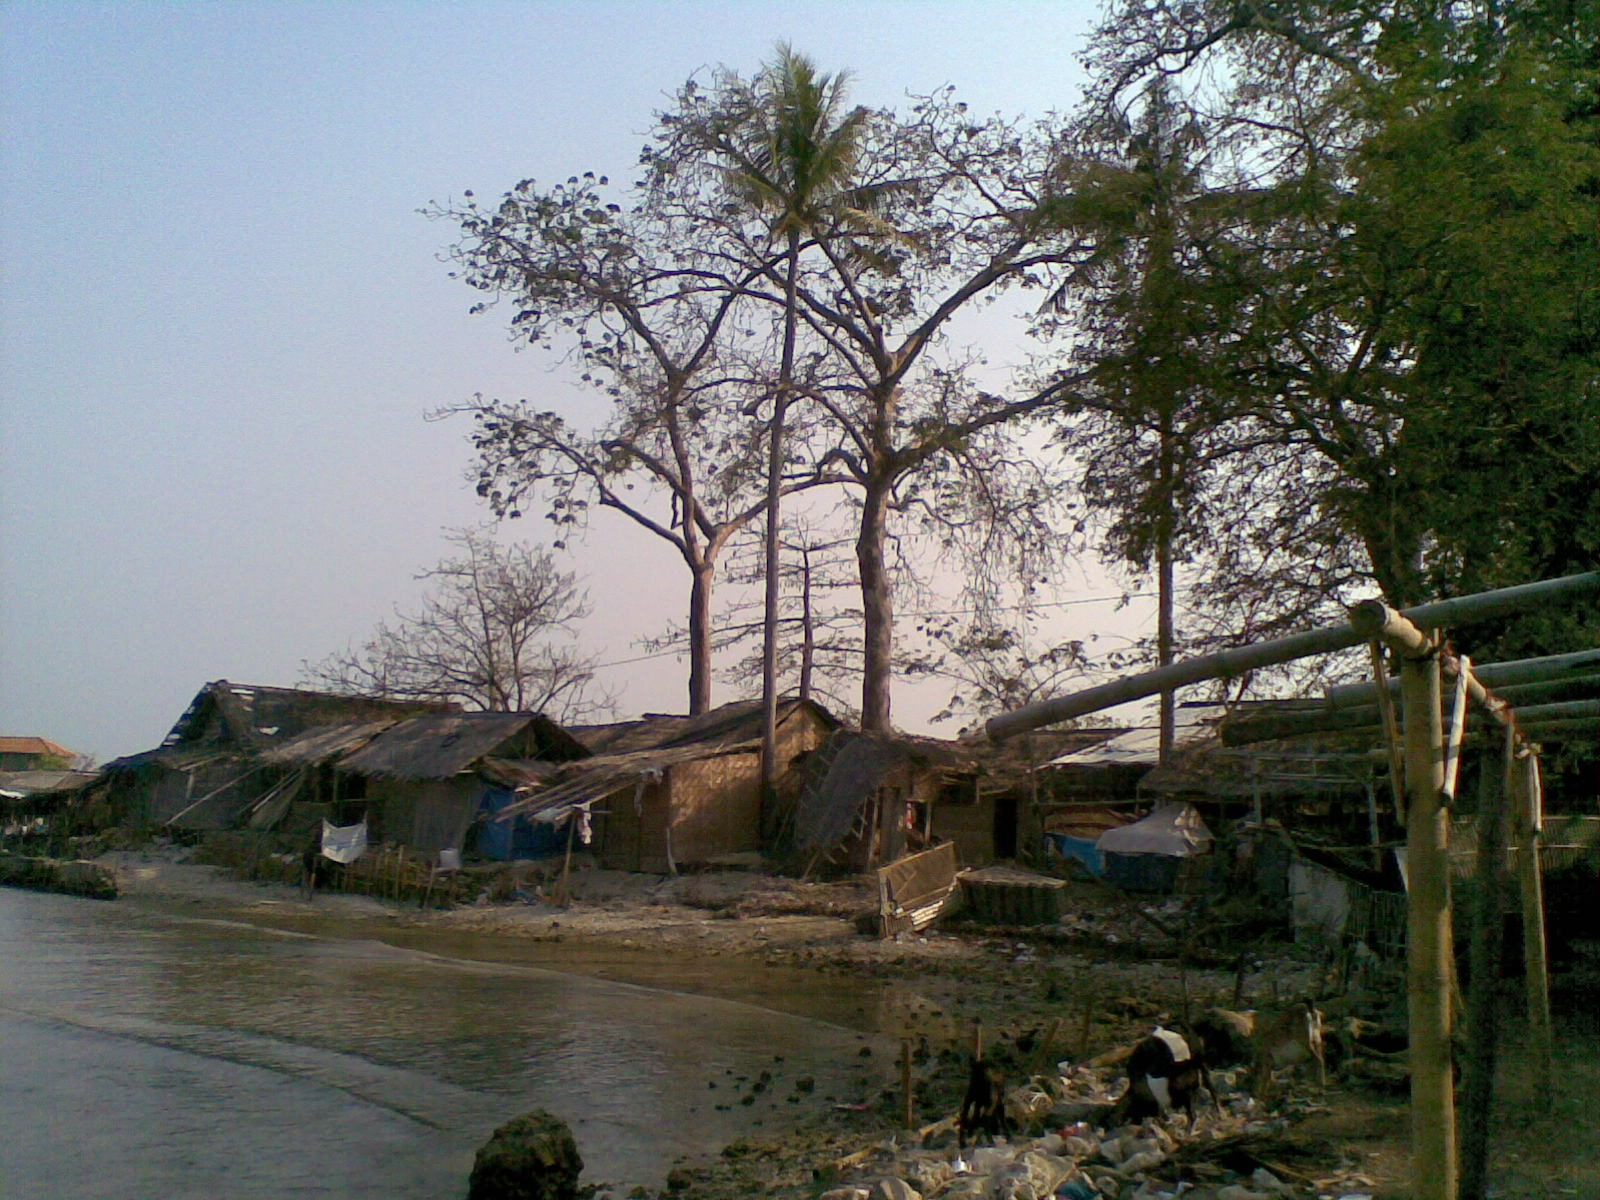 Pulau Cangkir Antara Tiada Oleh Cakra Inderasena Kab Tangerang